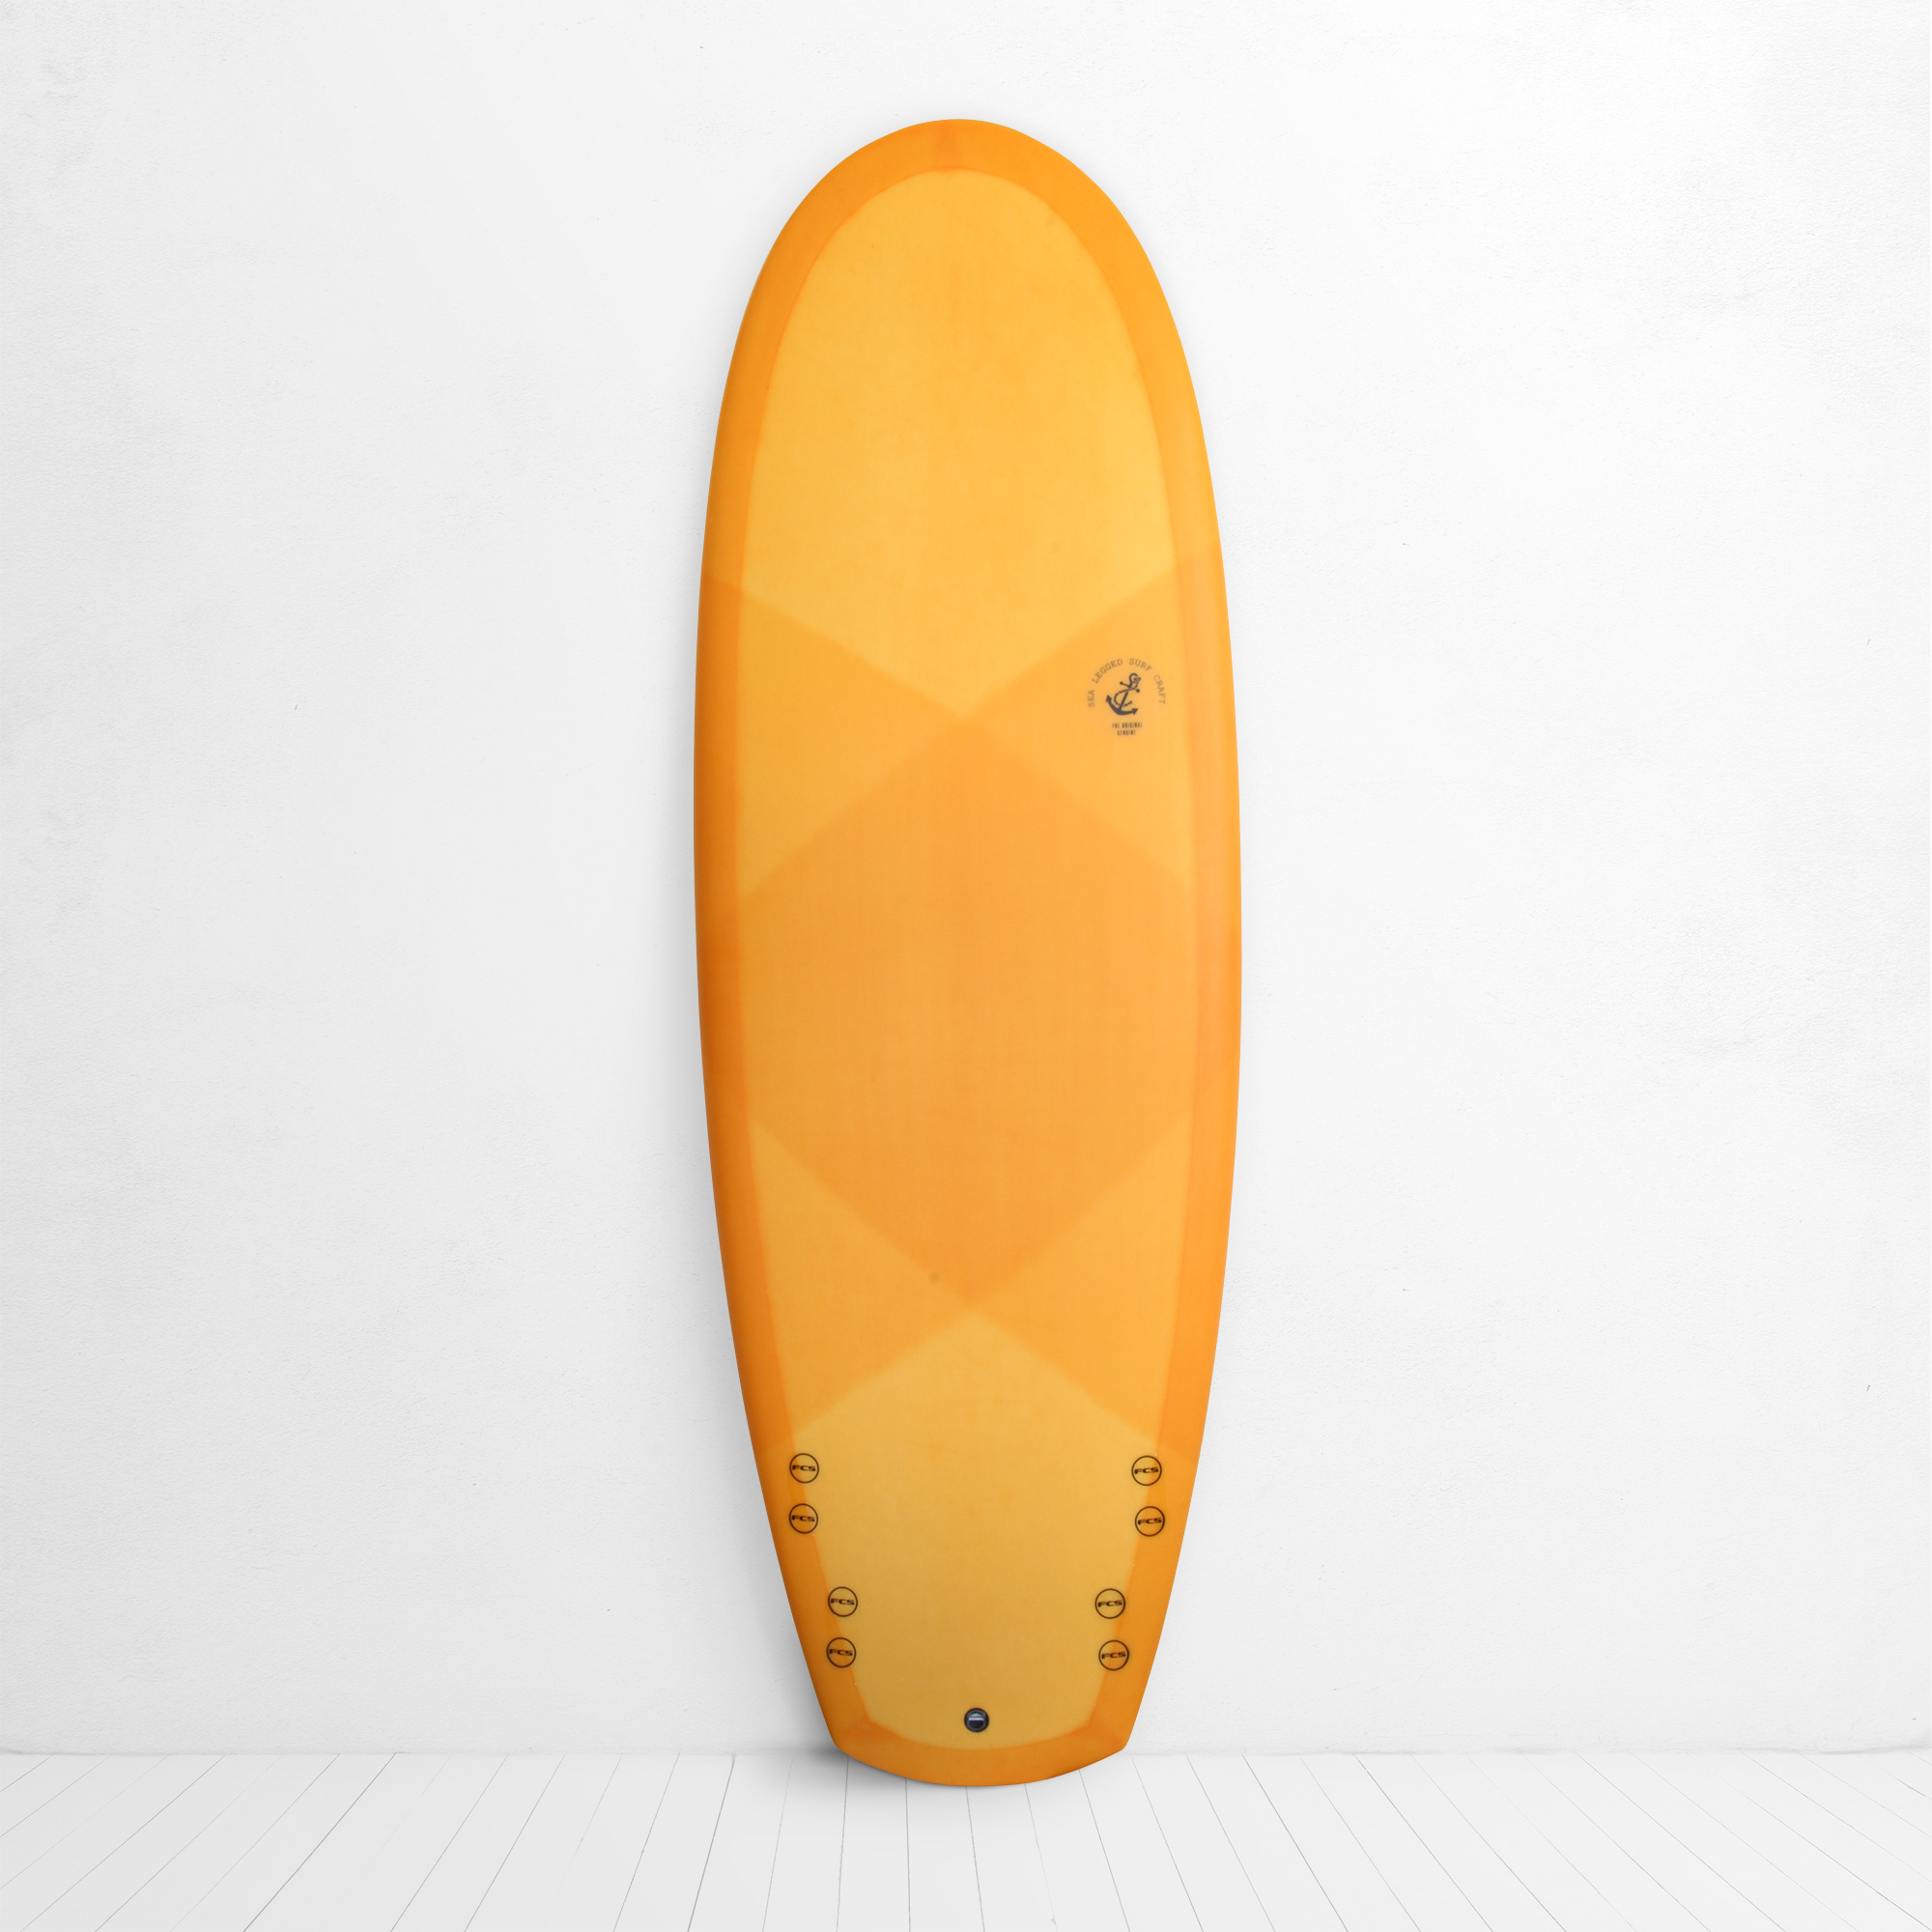 Boards-Orange-Top.jpg